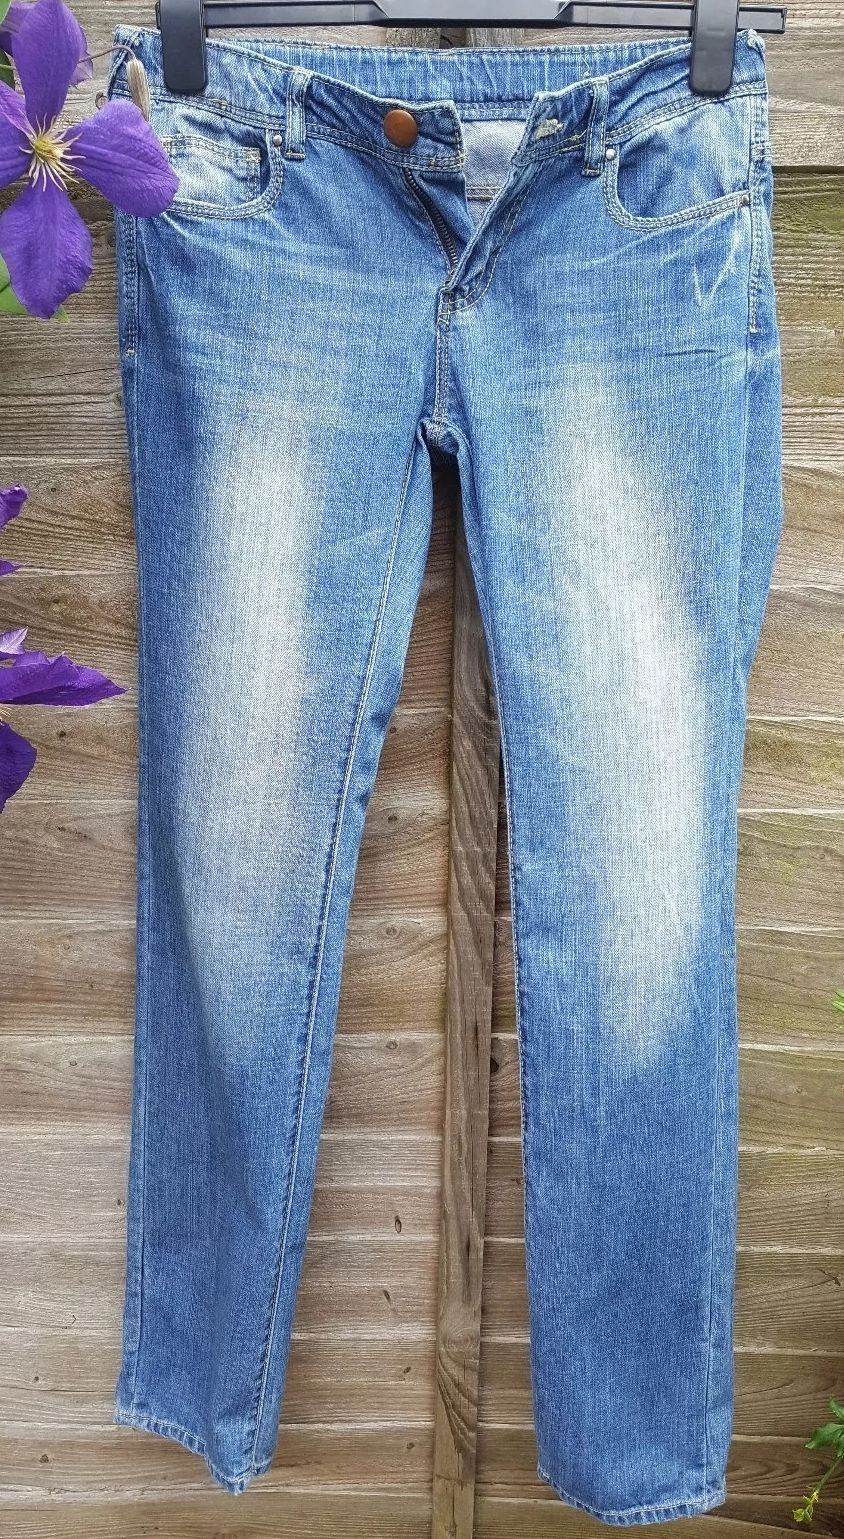 08c4c3798 ZARA Denim Blue Jeans Girls Size 11-12 Yrs 152 cm 28W 30L in Clothes ...